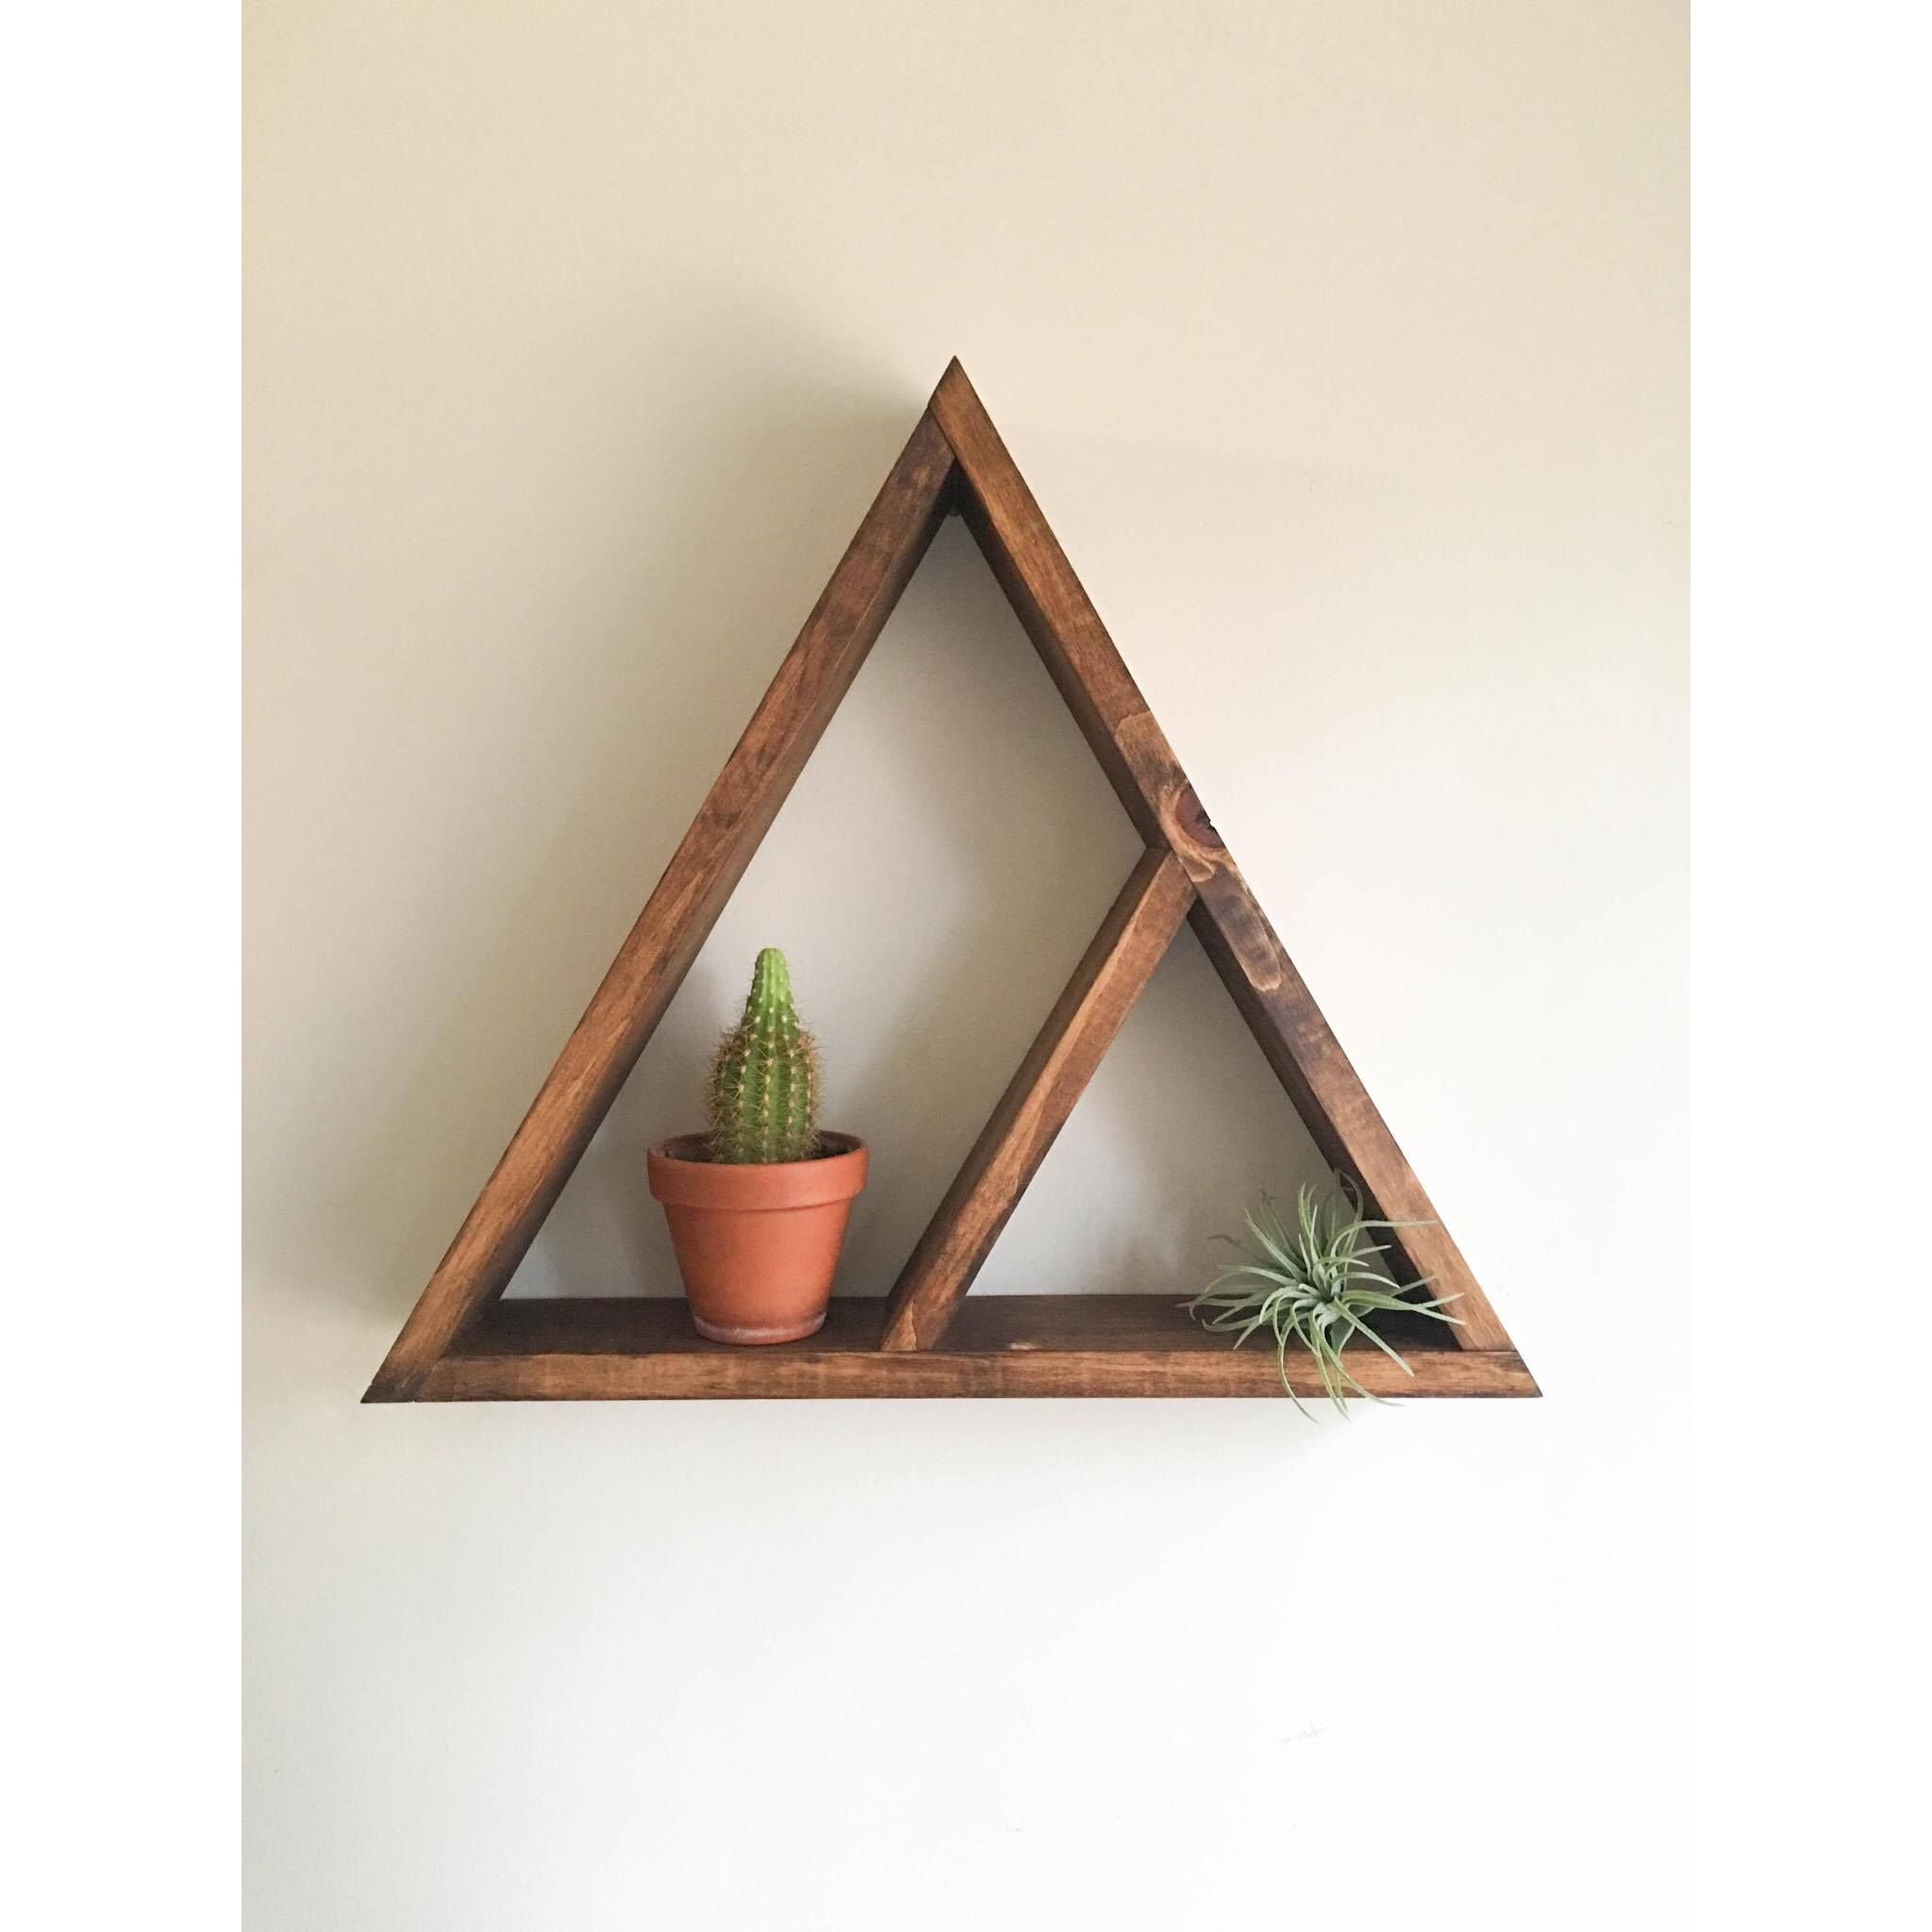 Triangle shelf crystal shelf shadow box wood shelf floating shelf wall shelf 2 tier wooden triangle shelf large triangle in photos this